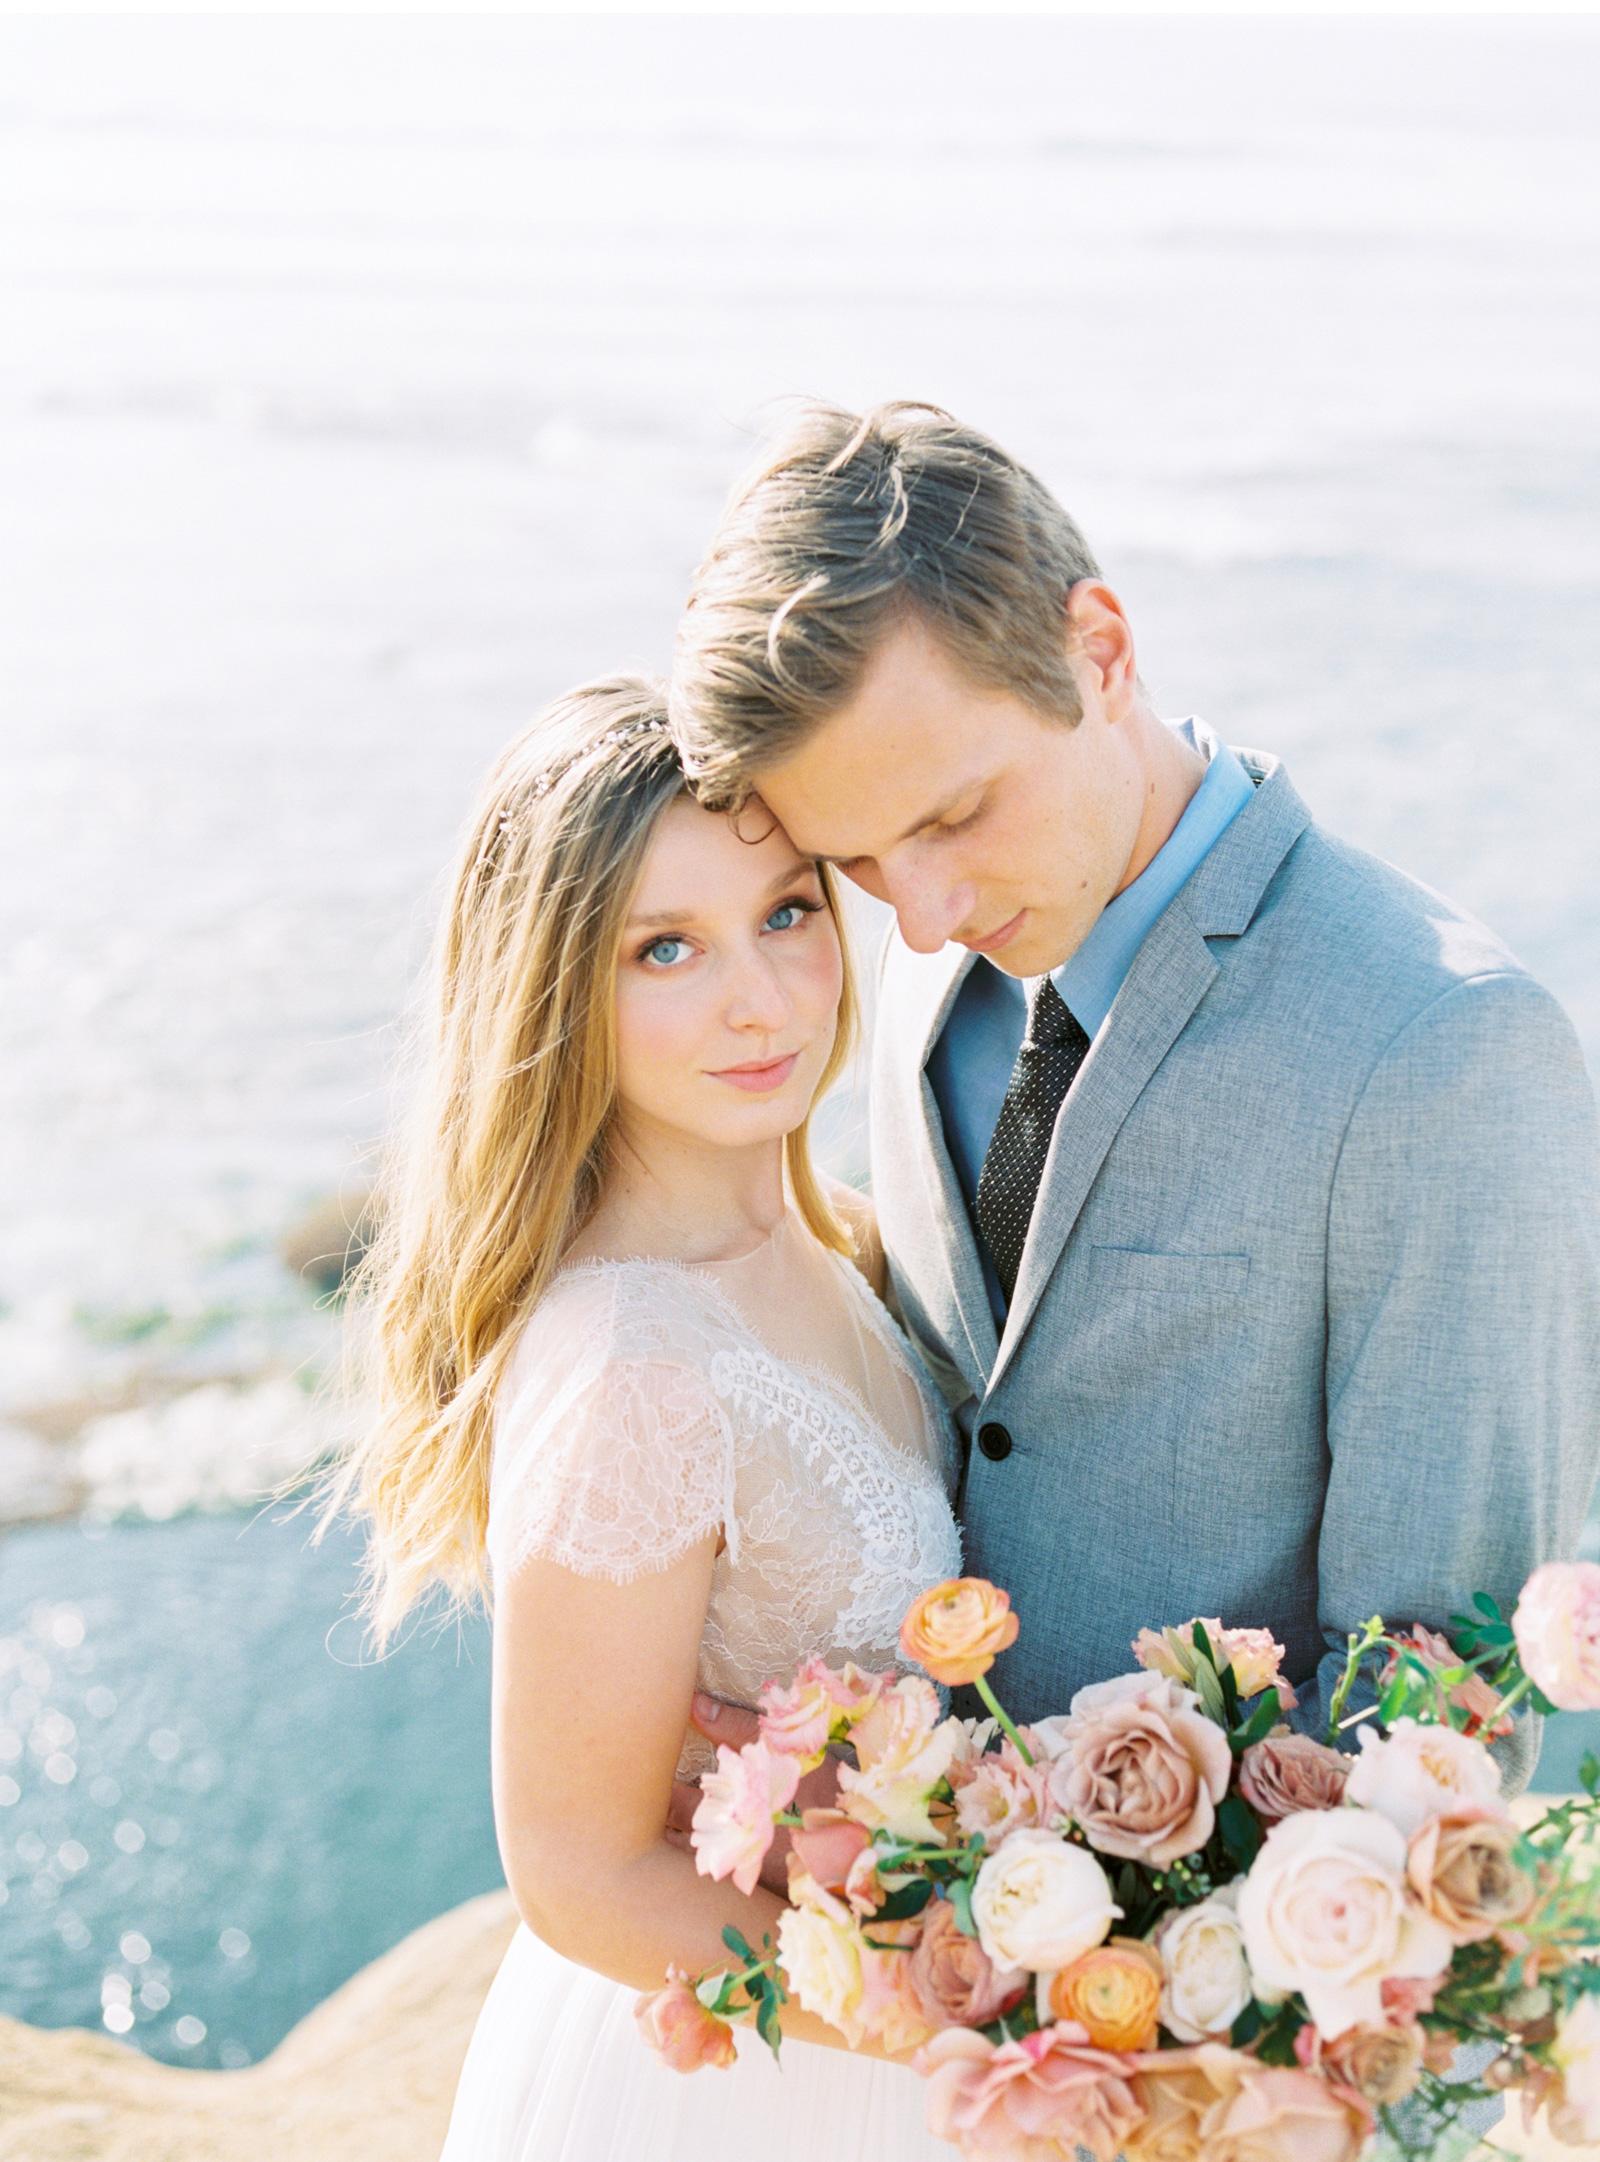 Style-Me-Pretty-California-Beach-Wedding-Natalie-Schutt-Photography_11.jpg